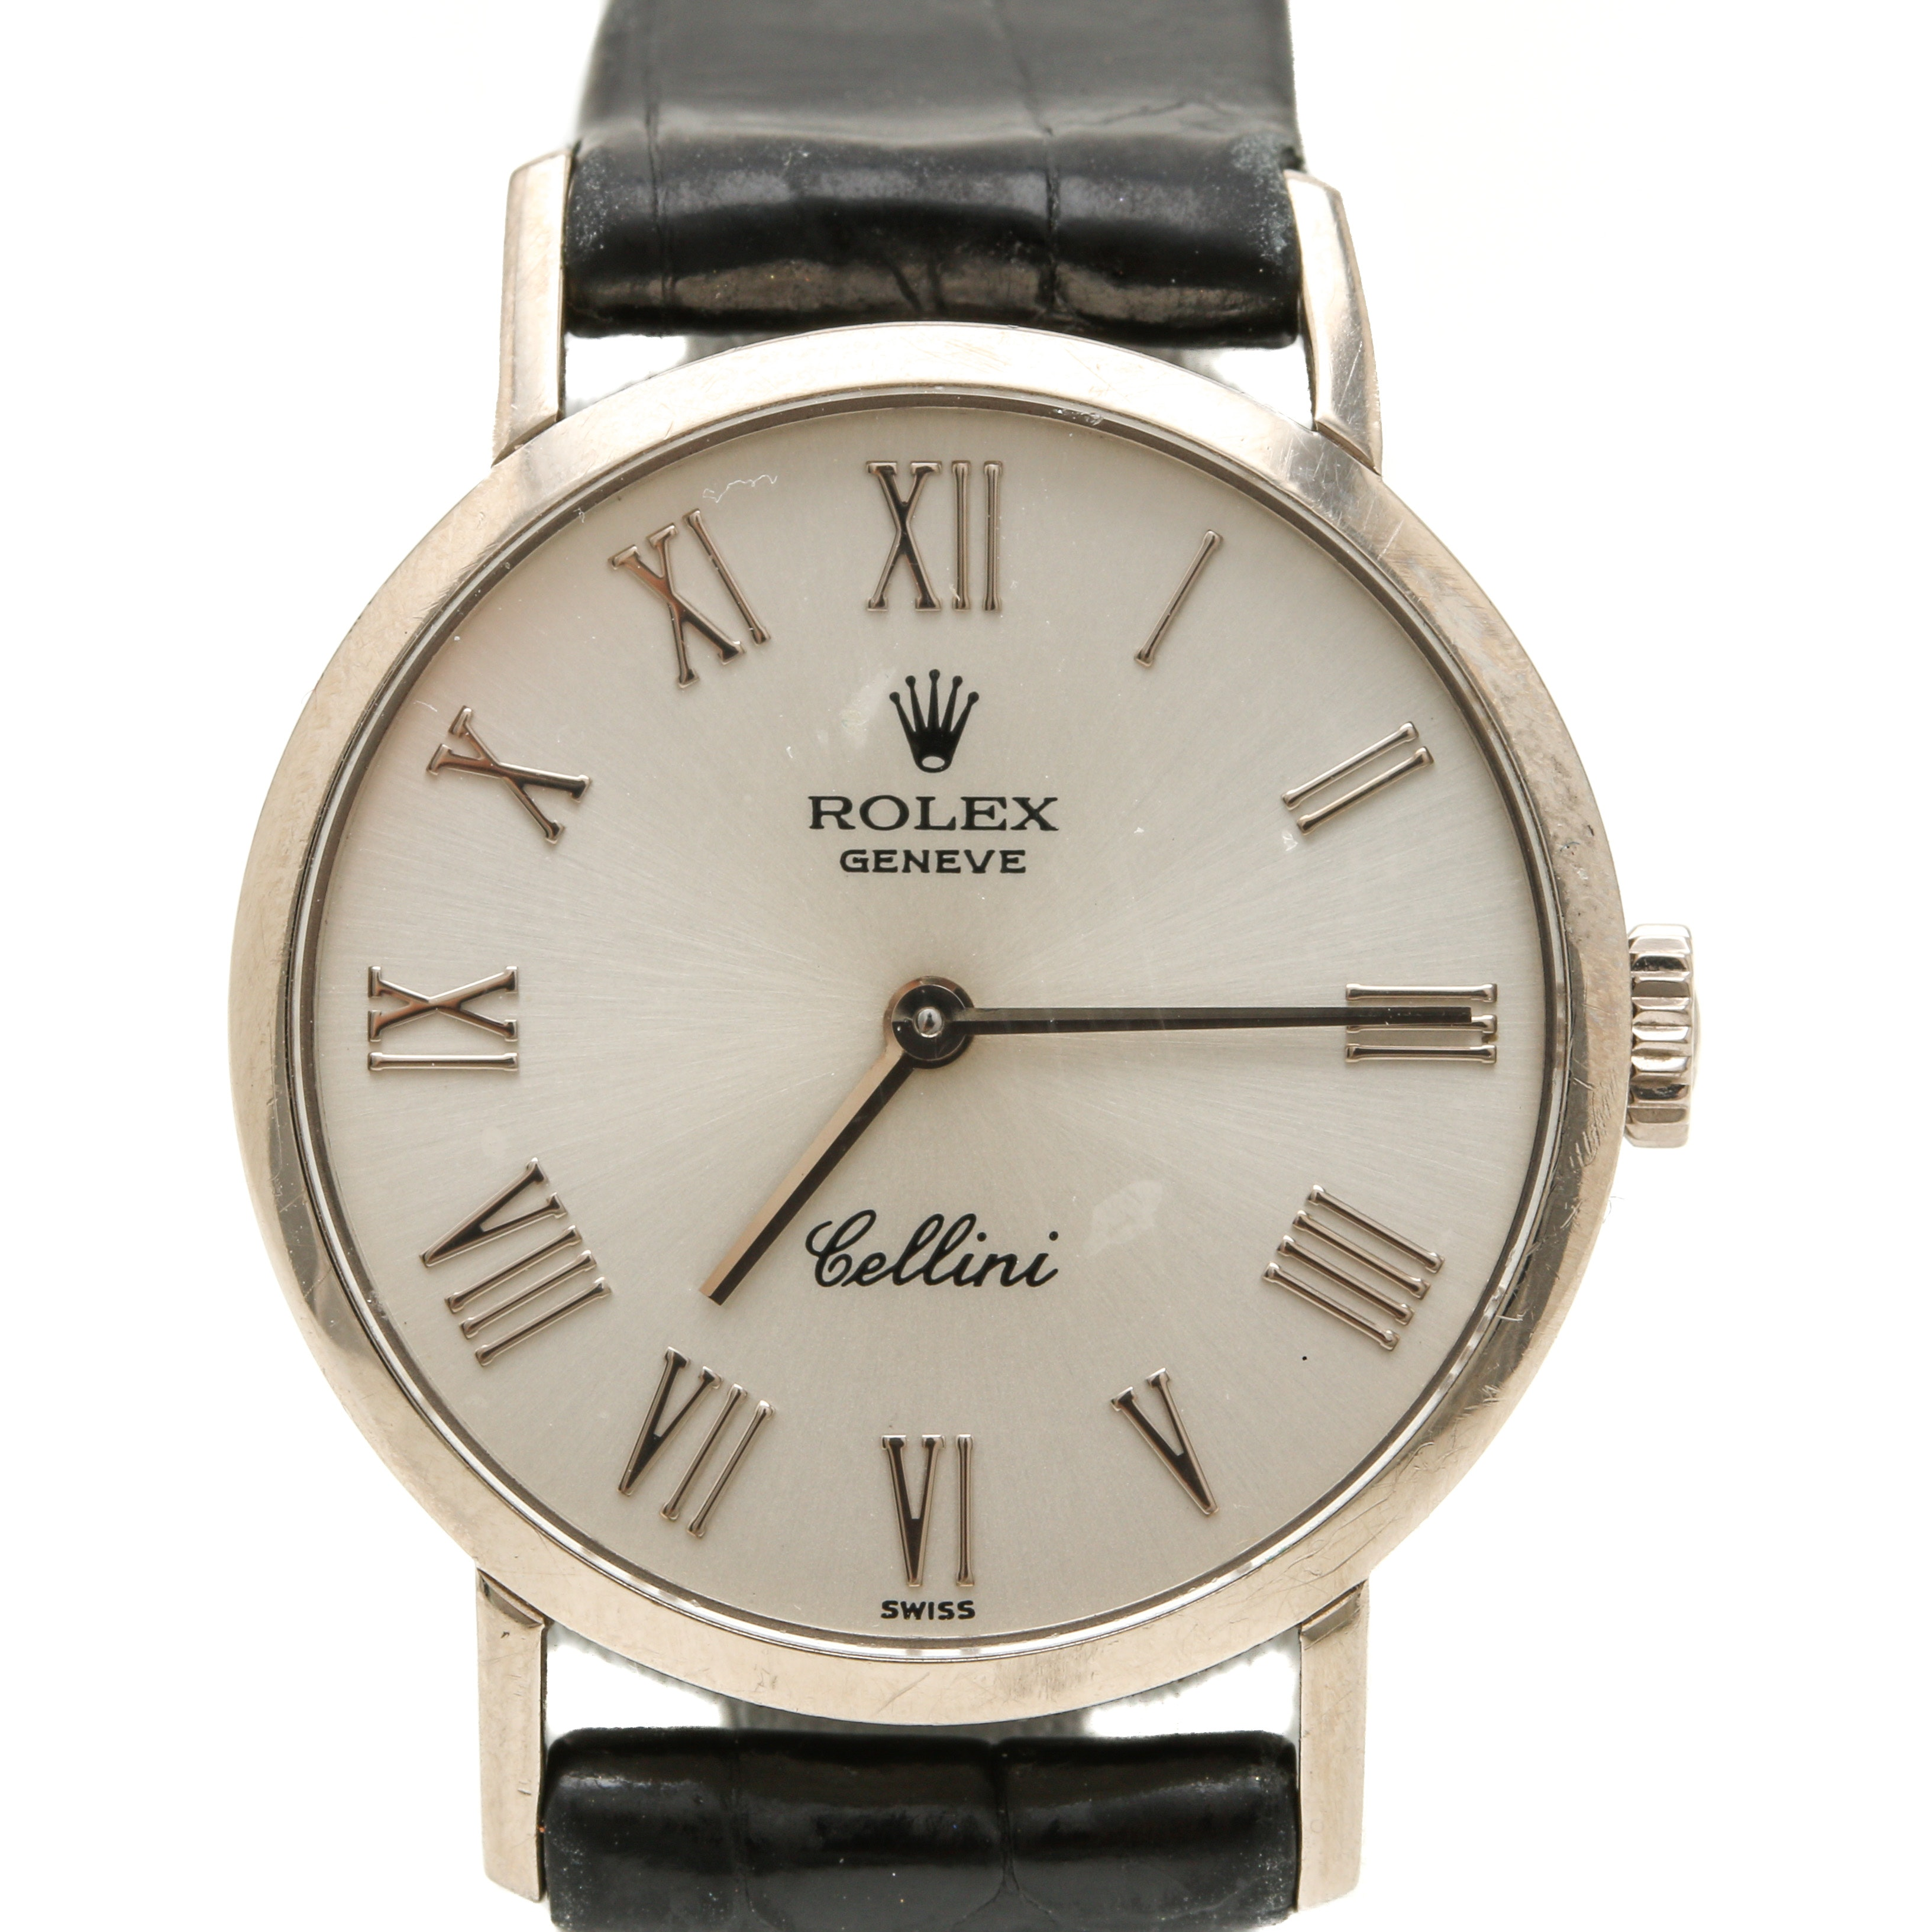 "Rolex Geneve 18K White Gold ""Cellini"" Wristwatch"